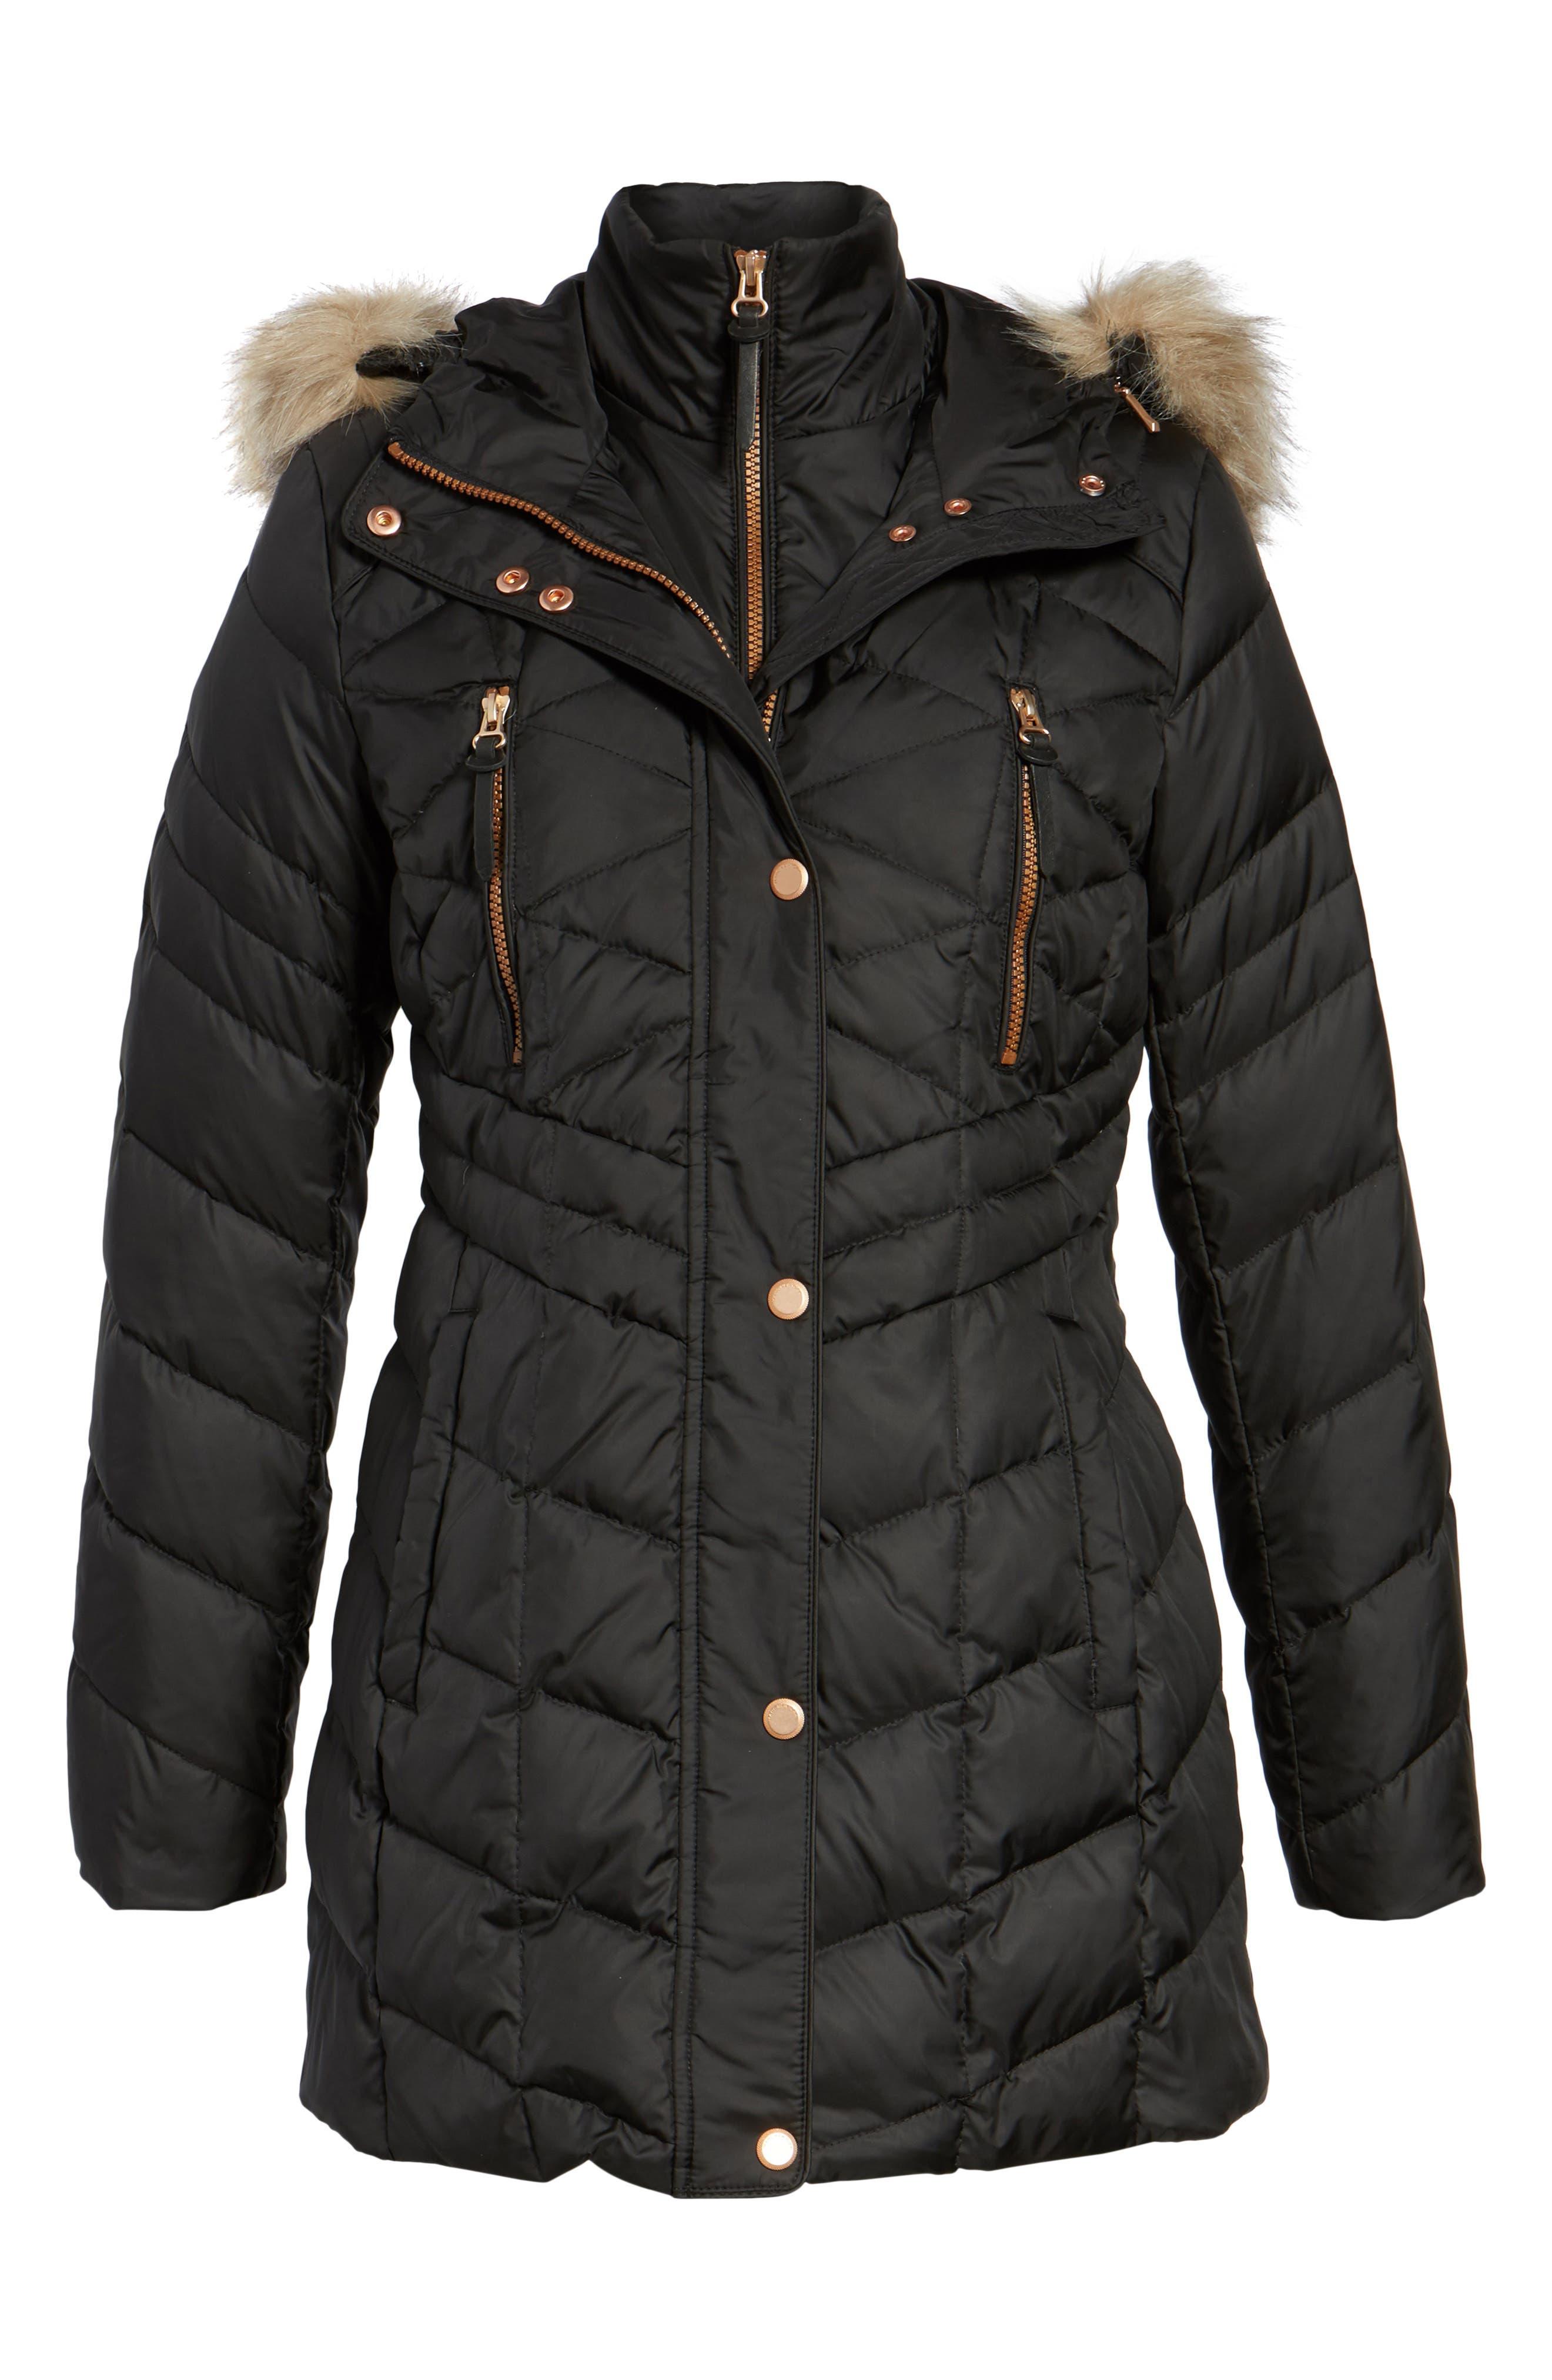 Marley 30 Coat with Detachable Faux Fur,                             Alternate thumbnail 5, color,                             001